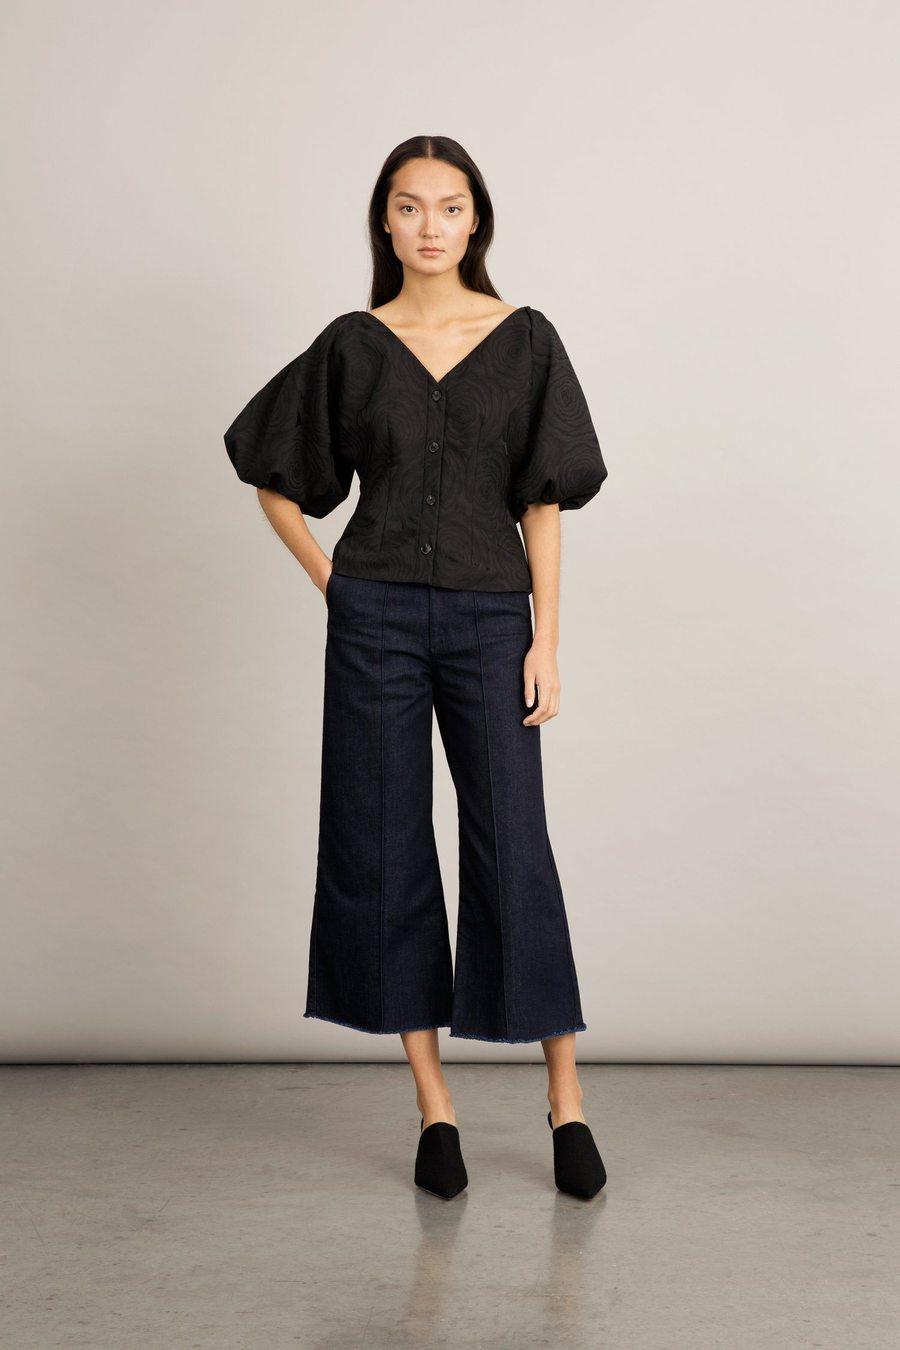 brenta-top-black-jacquard-top-stylein-552925_900x.jpg